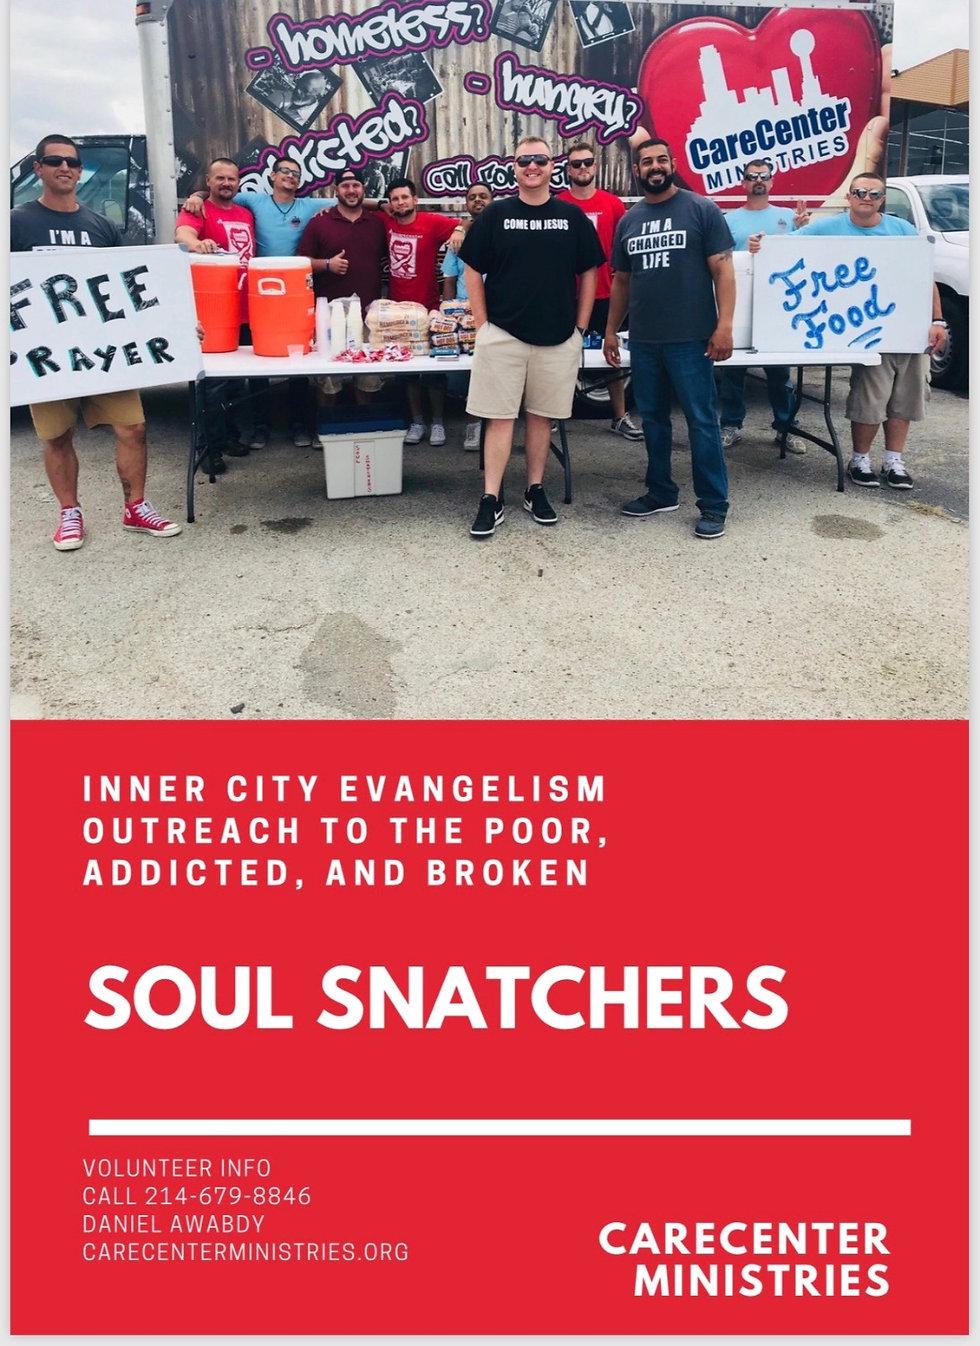 Soul Snatchers evangelism outreach